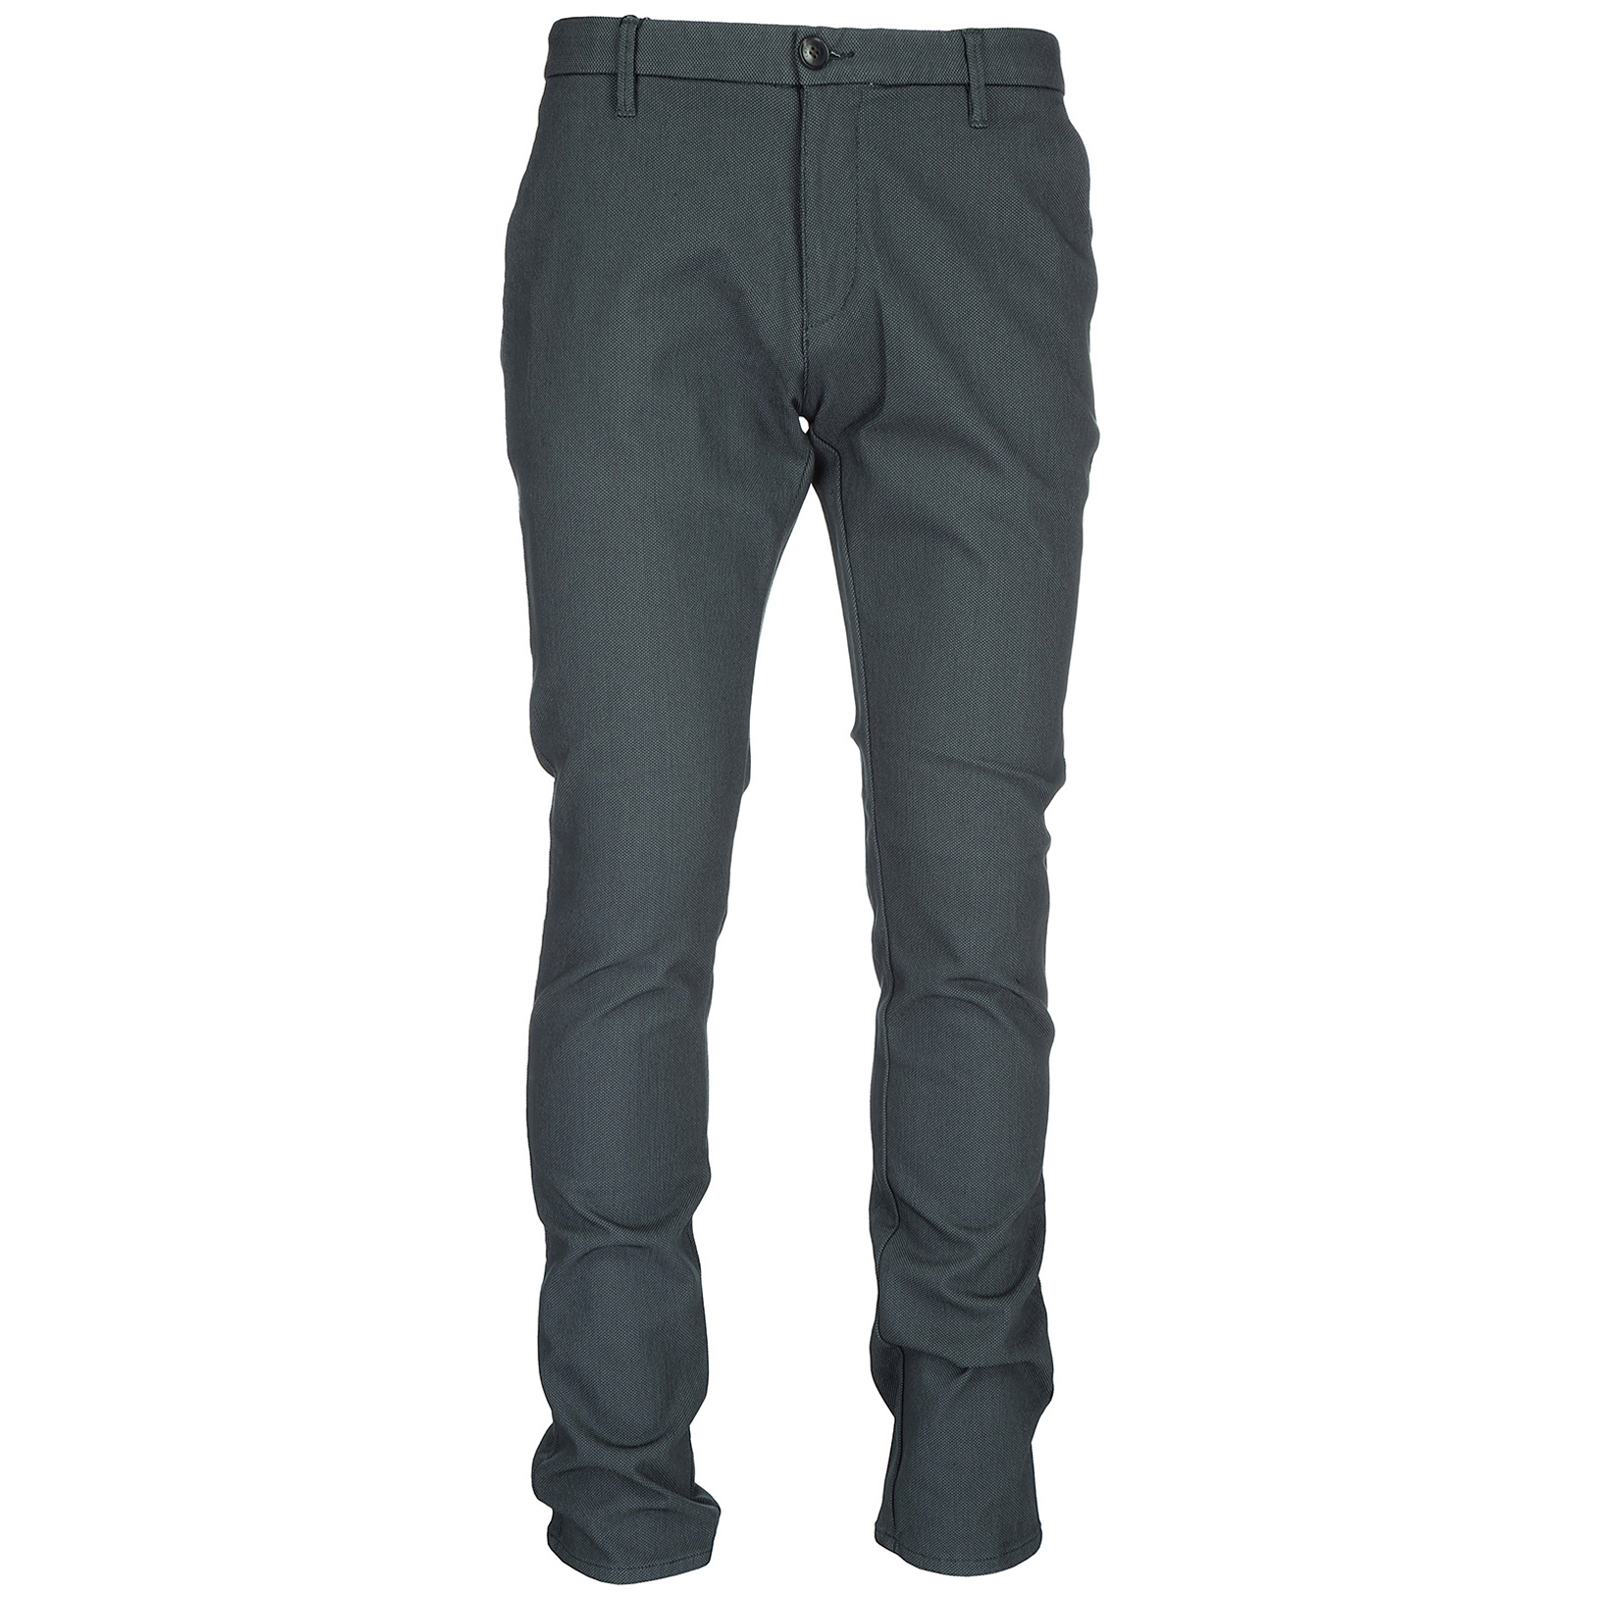 b4c970f1685b Pantalone Emporio Armani 3Z1P151N4UZ0637 grigio